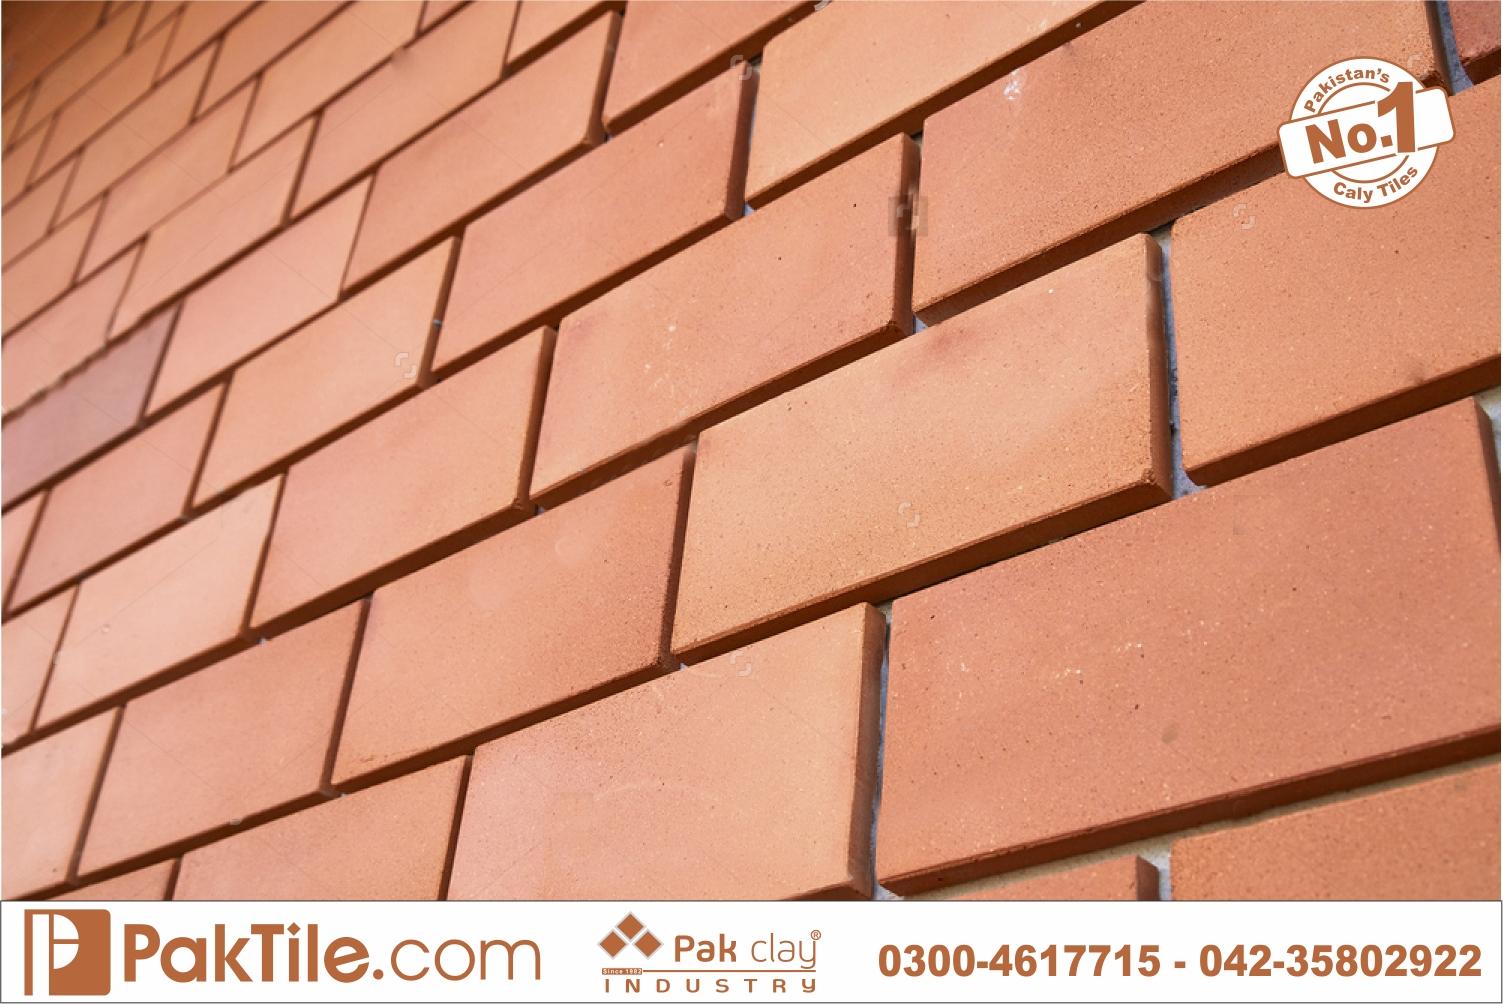 4 Red Gas Brick House Exterior Interior Wall Facing Facade Tiles Textures Price in Pakistan Images